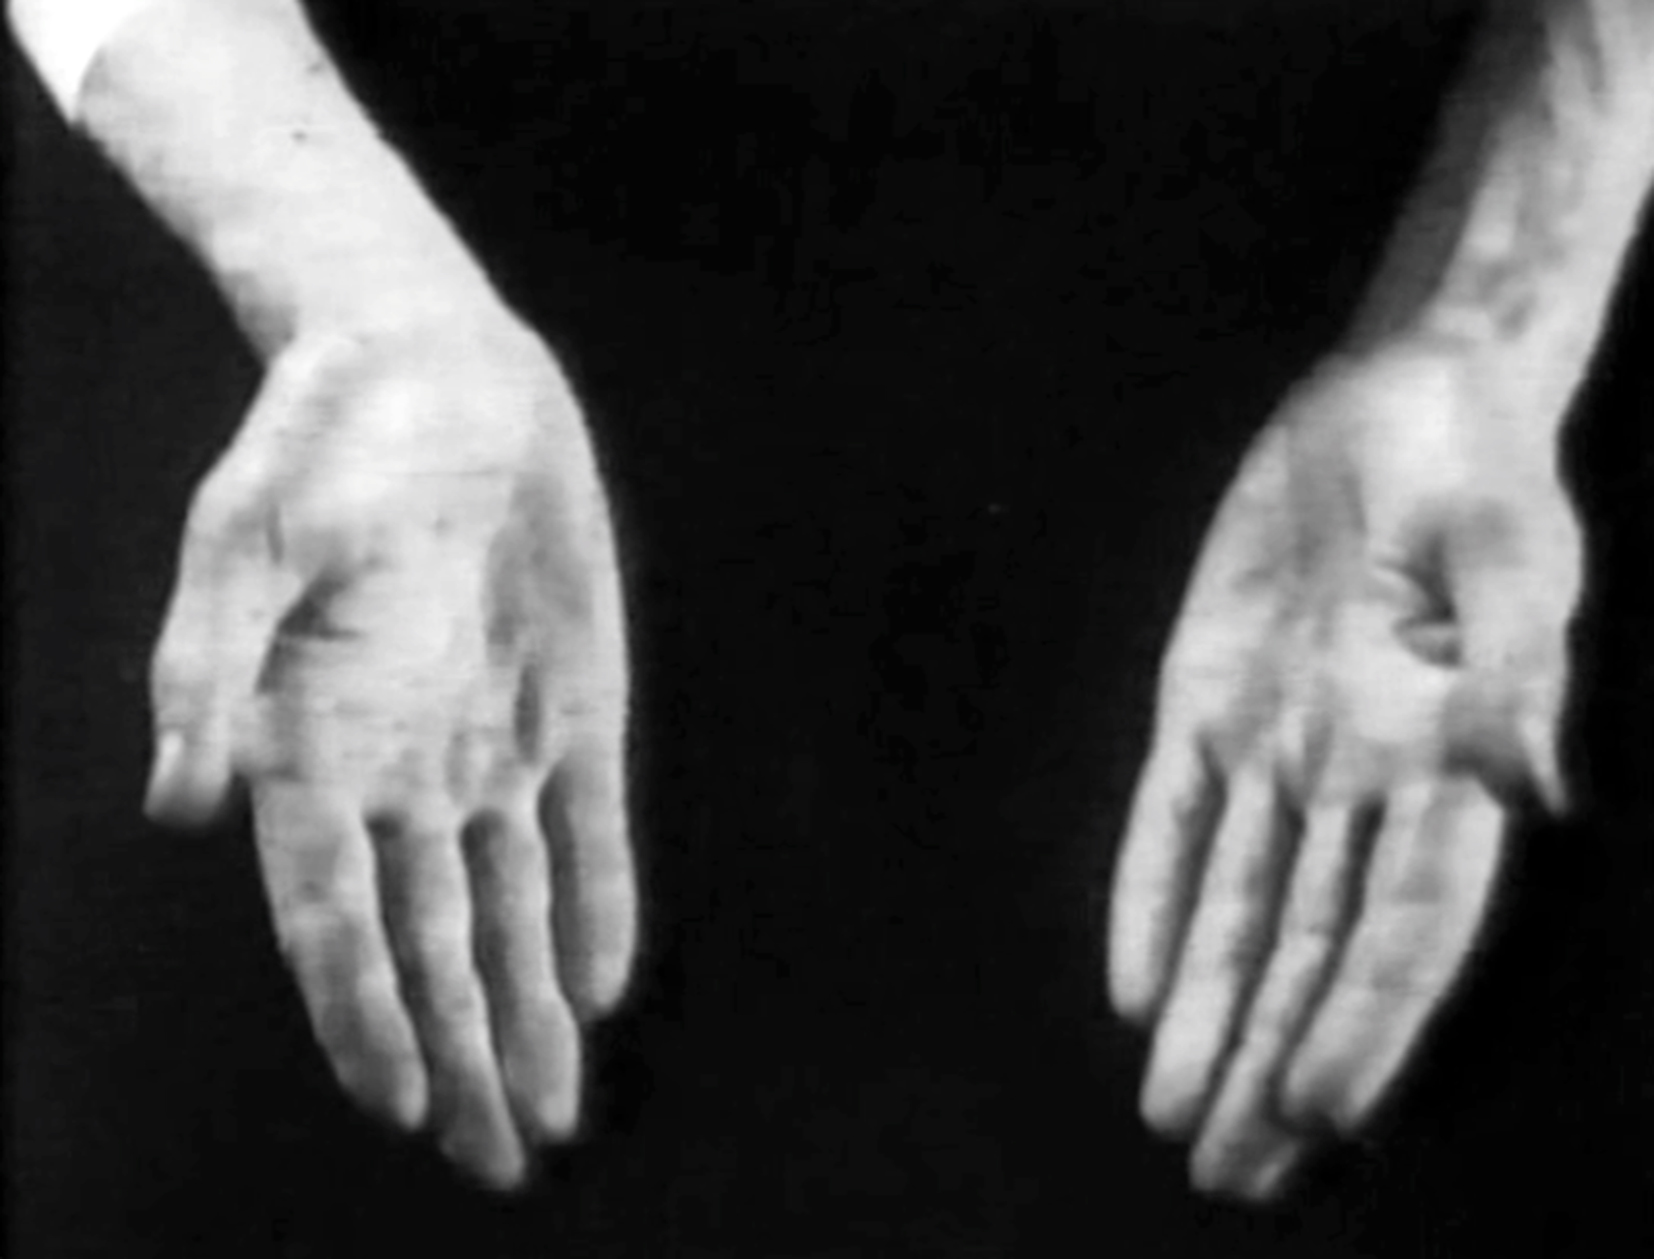 Notations-hands